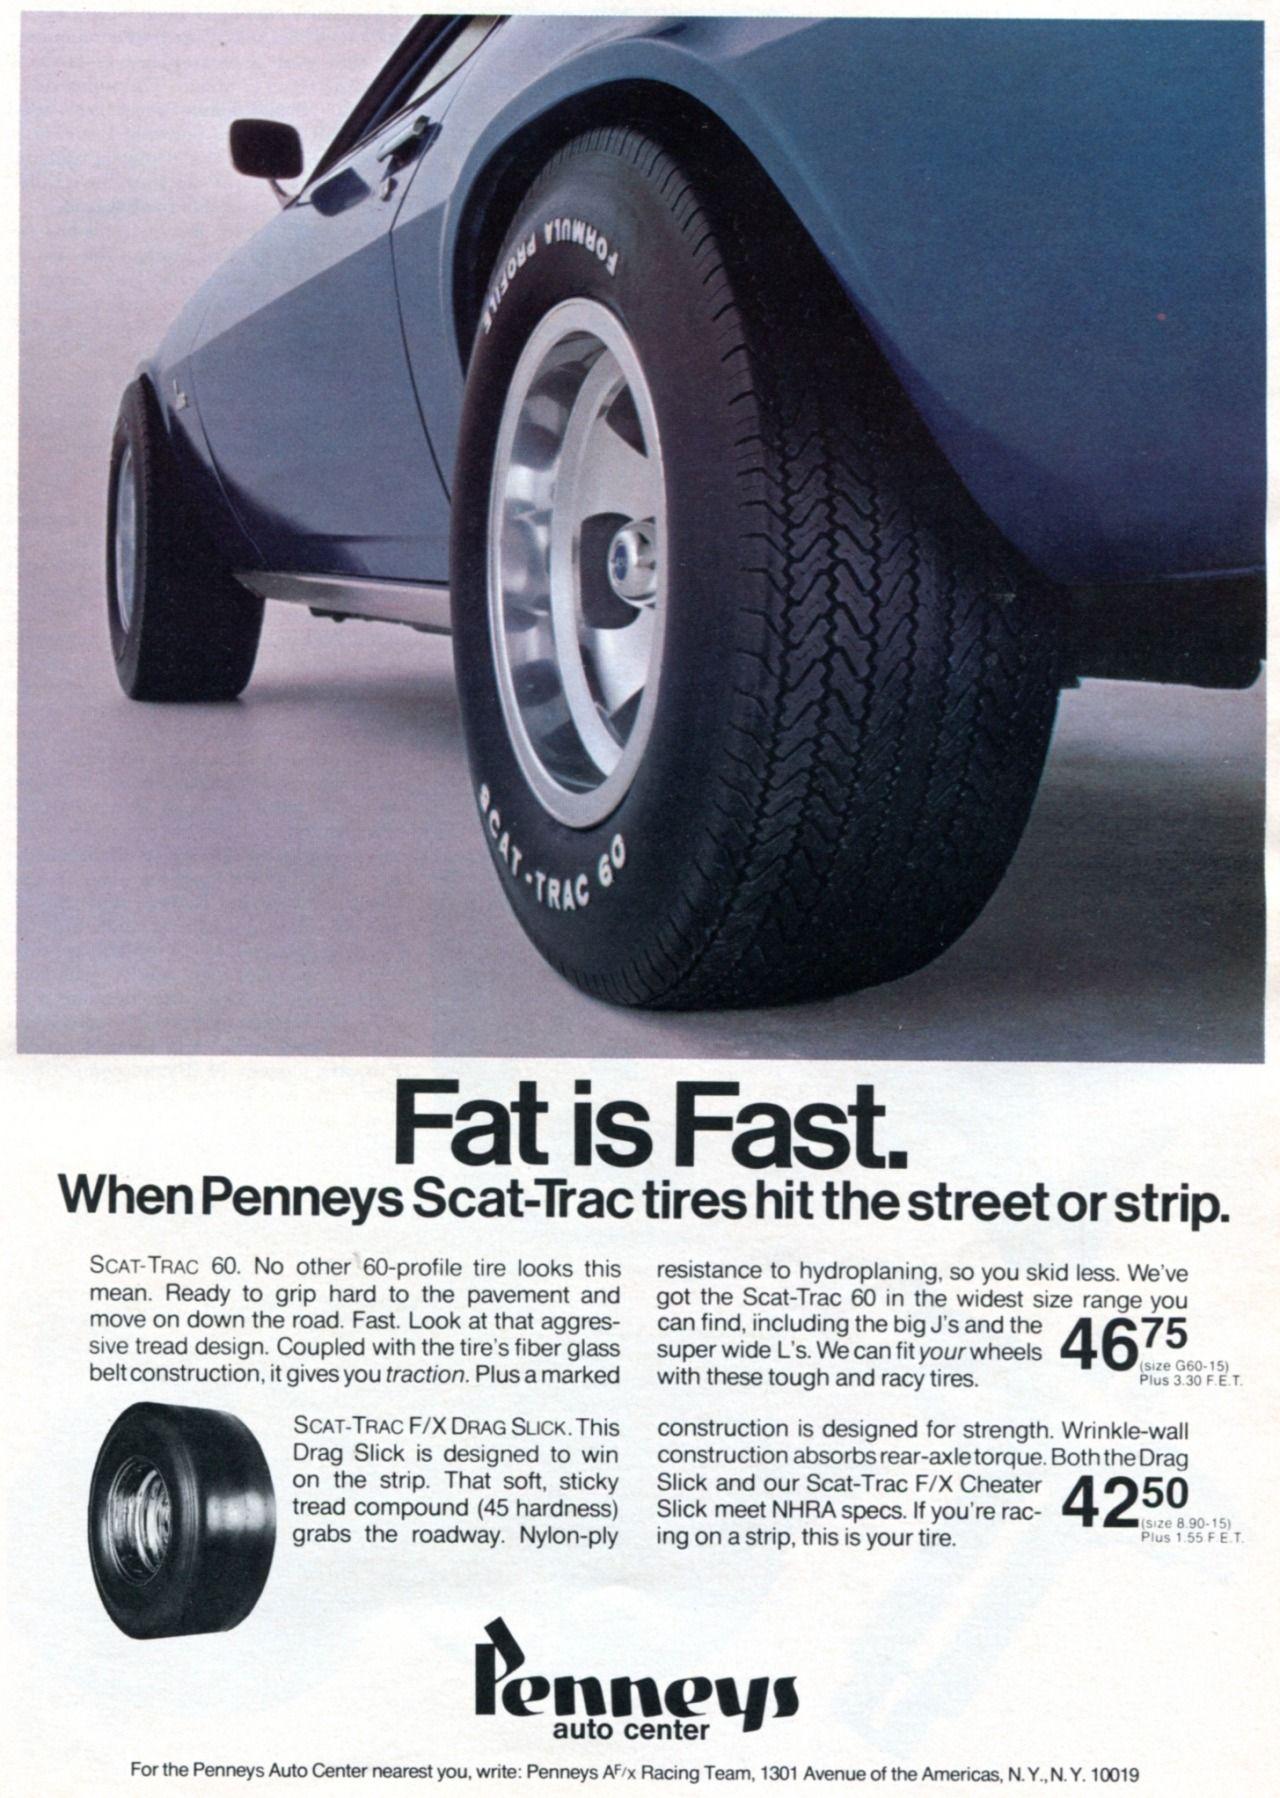 Some wheel cataloque stuff      Retro Rides   Muscle cars